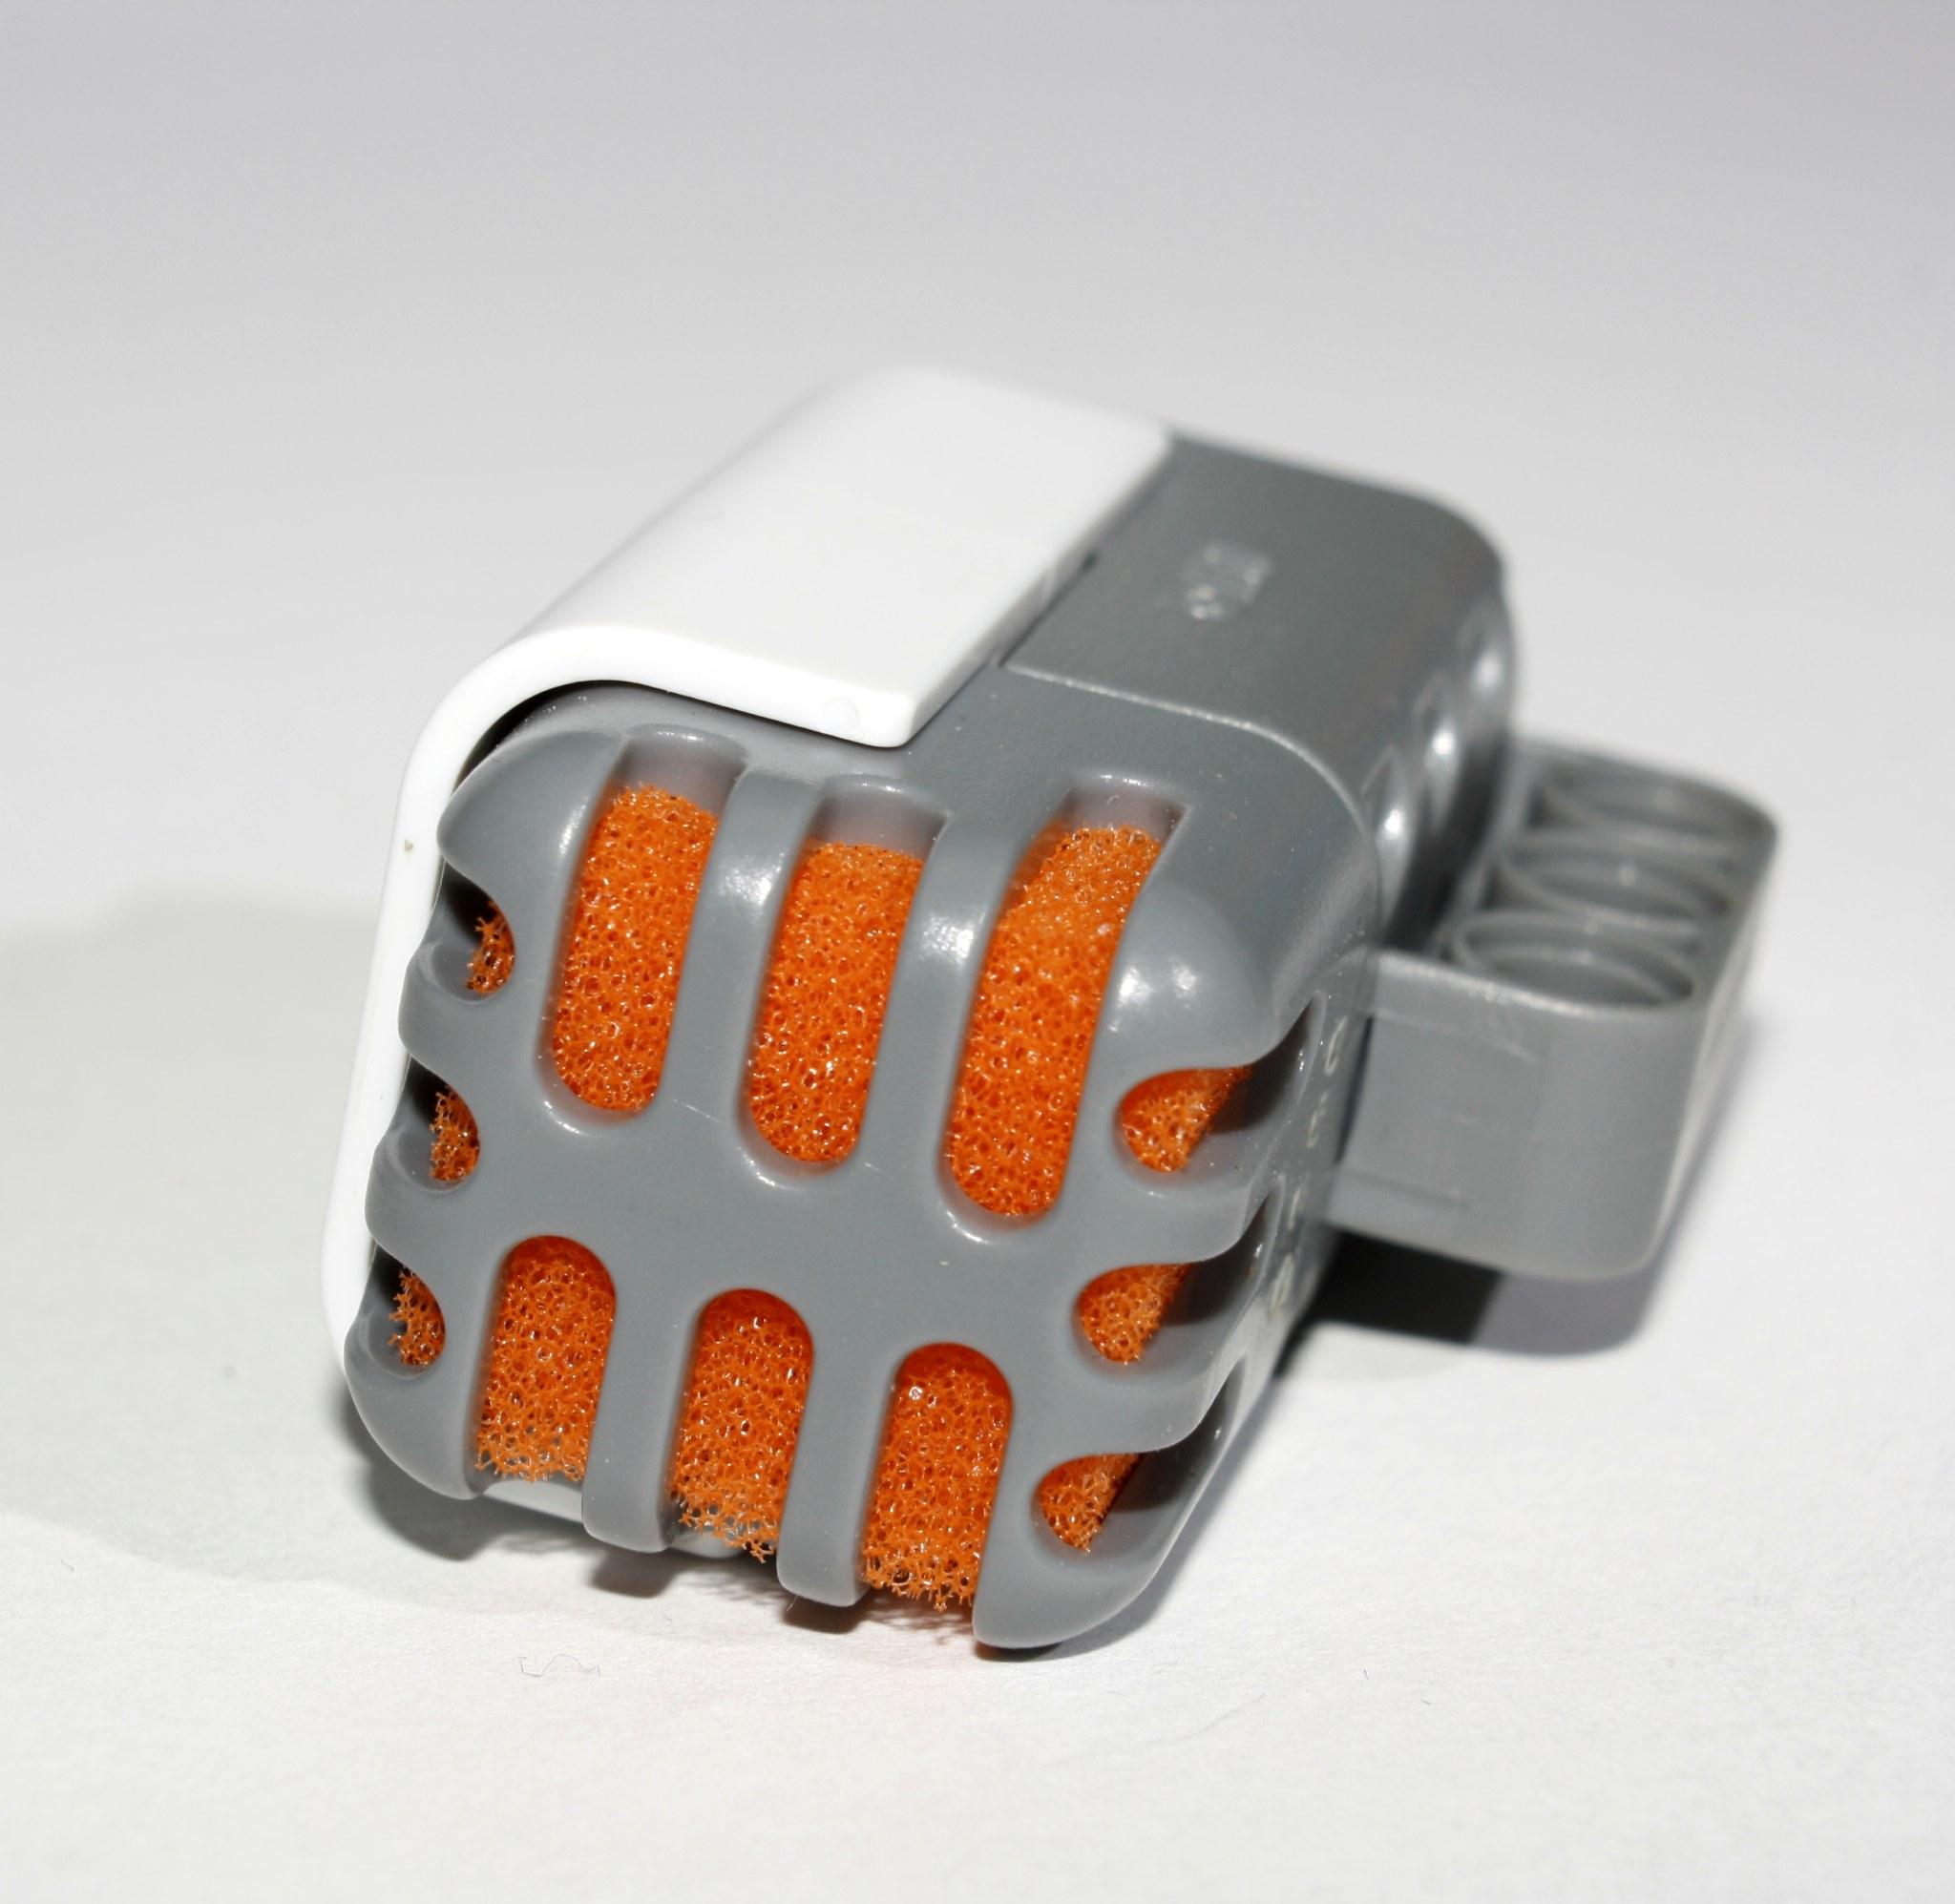 Lego Mindstorms Nxt   Printer Building Instructions